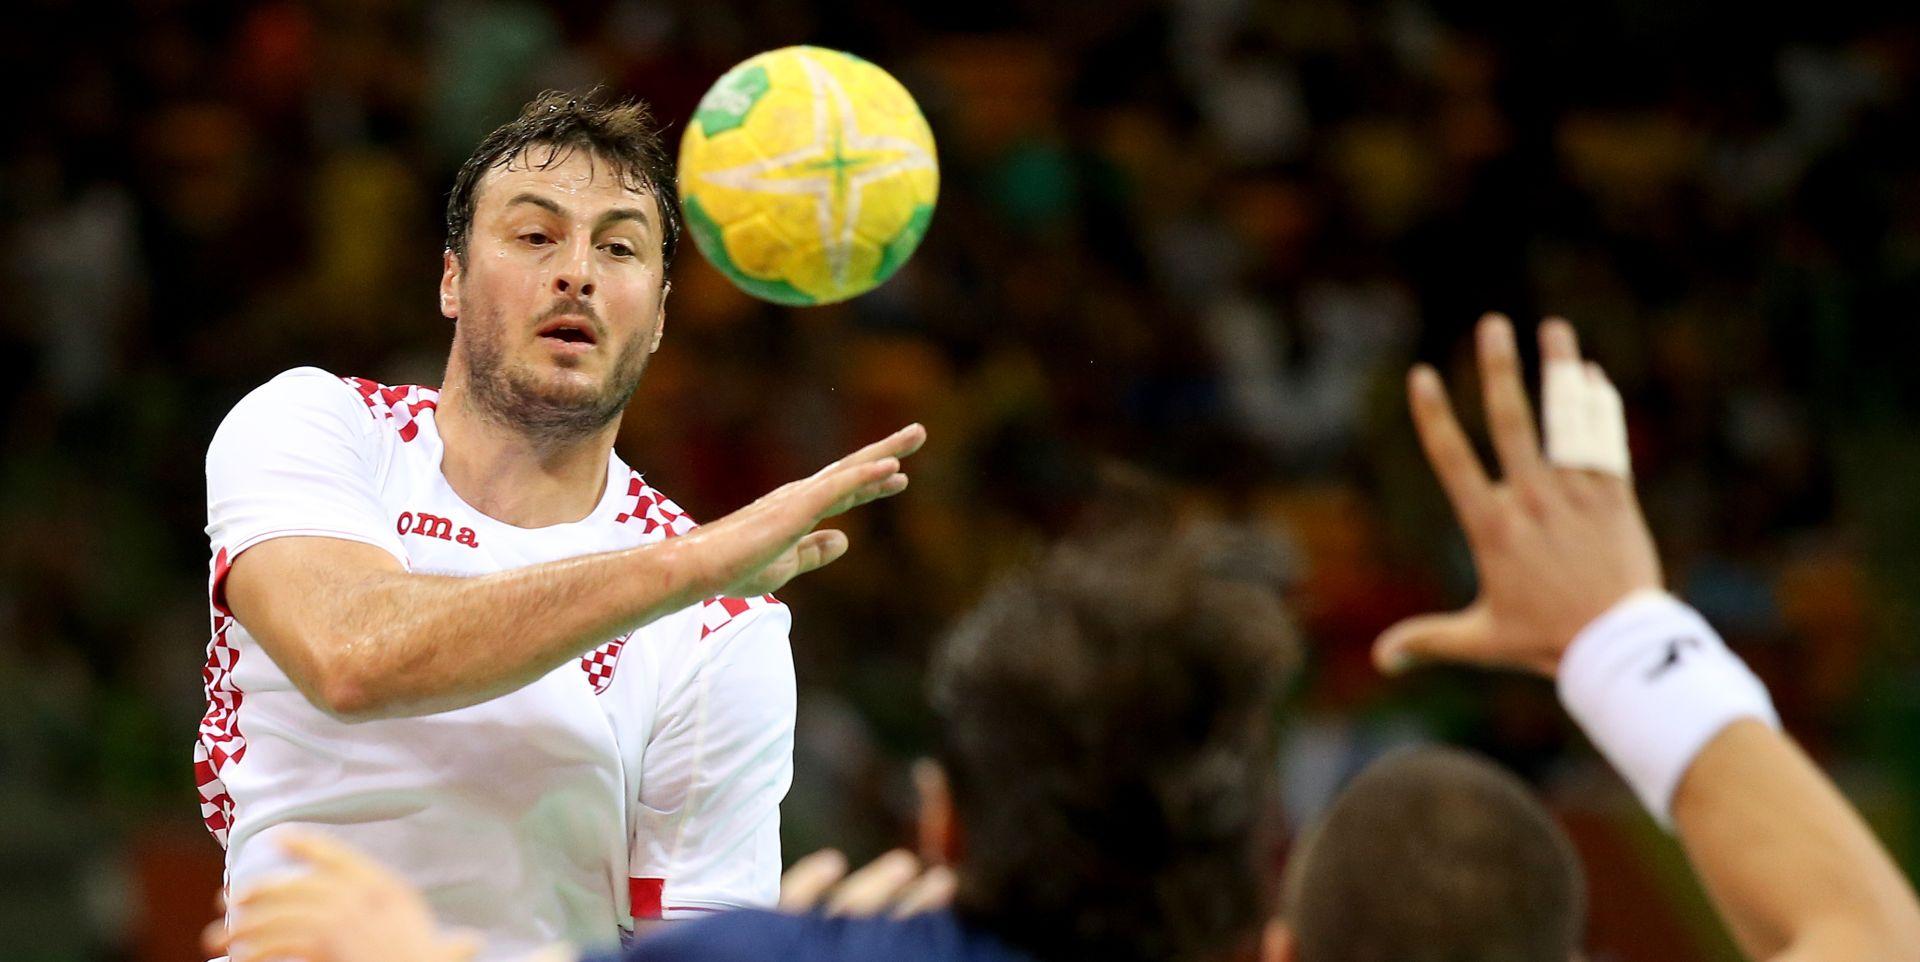 OI RUKOMET Hrvatska se provukla protiv Argentine